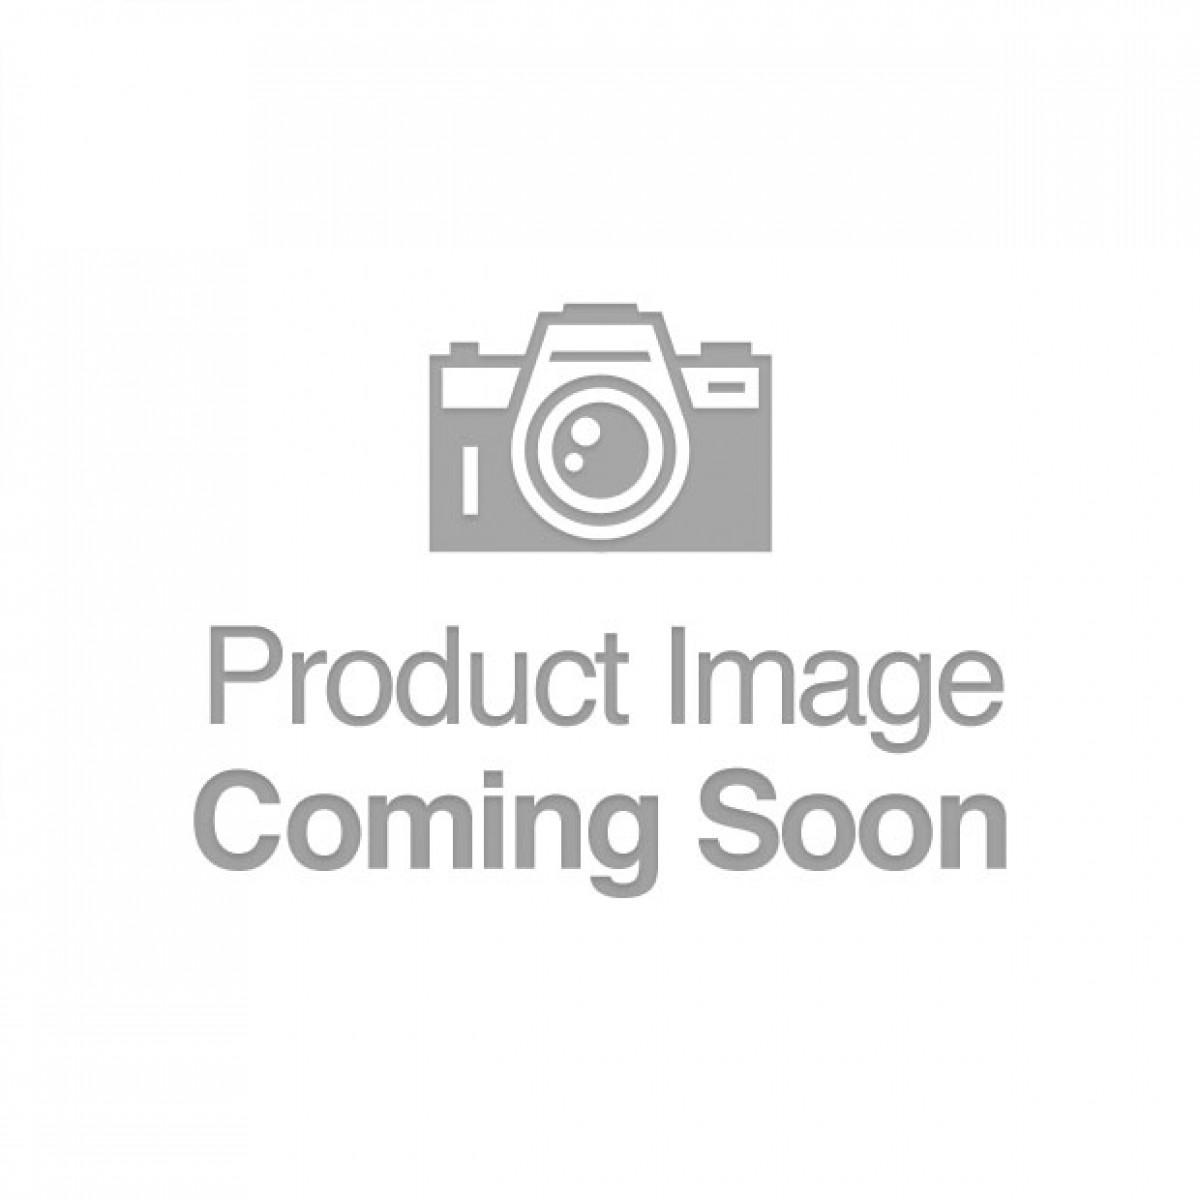 Dorcel G-Stormer Thrusting G Spot Rabbit - Black/Gold